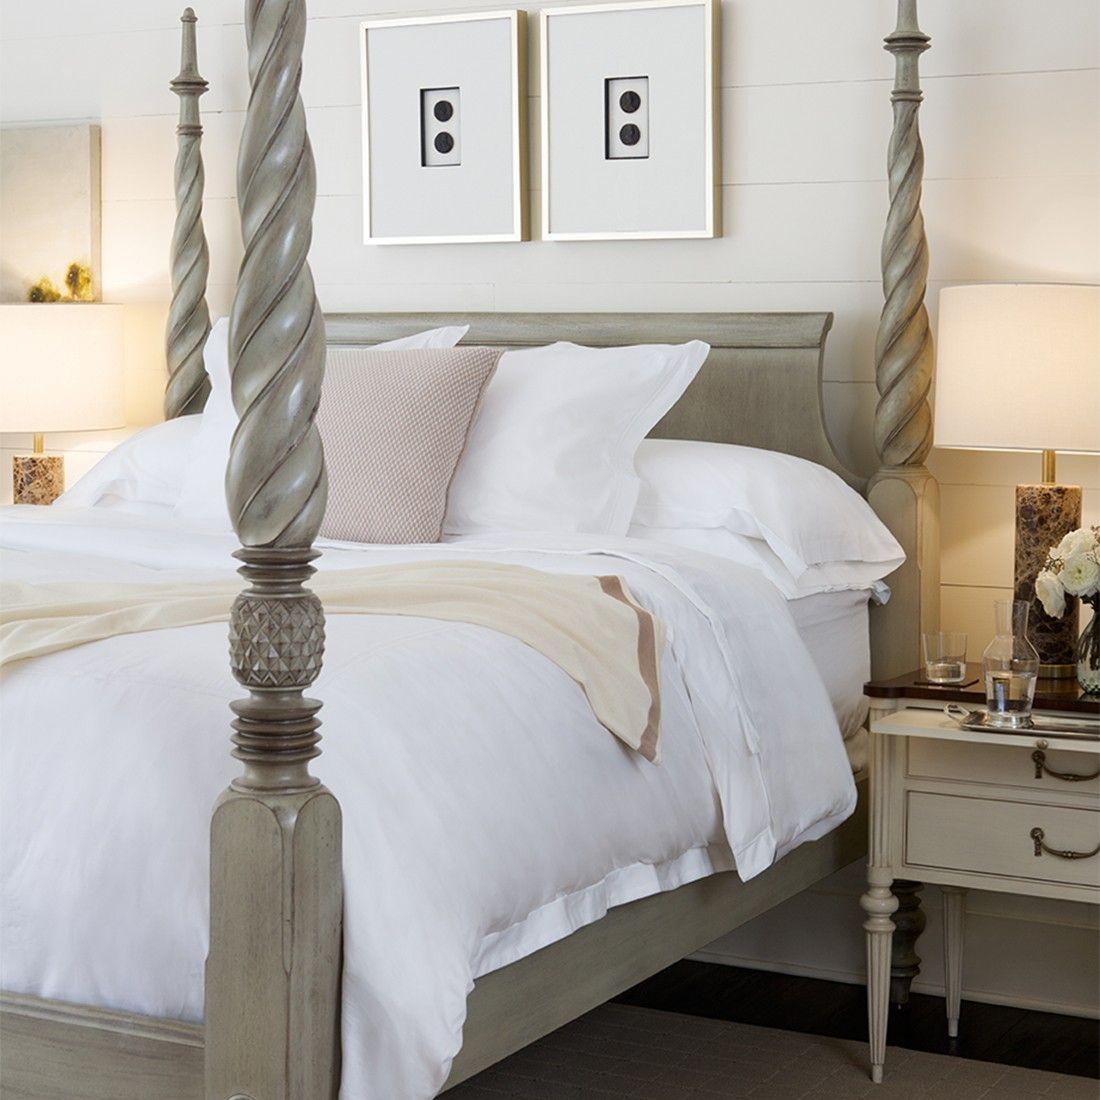 Hickory Chair Bed Hickory chair, Bed, Chair bed